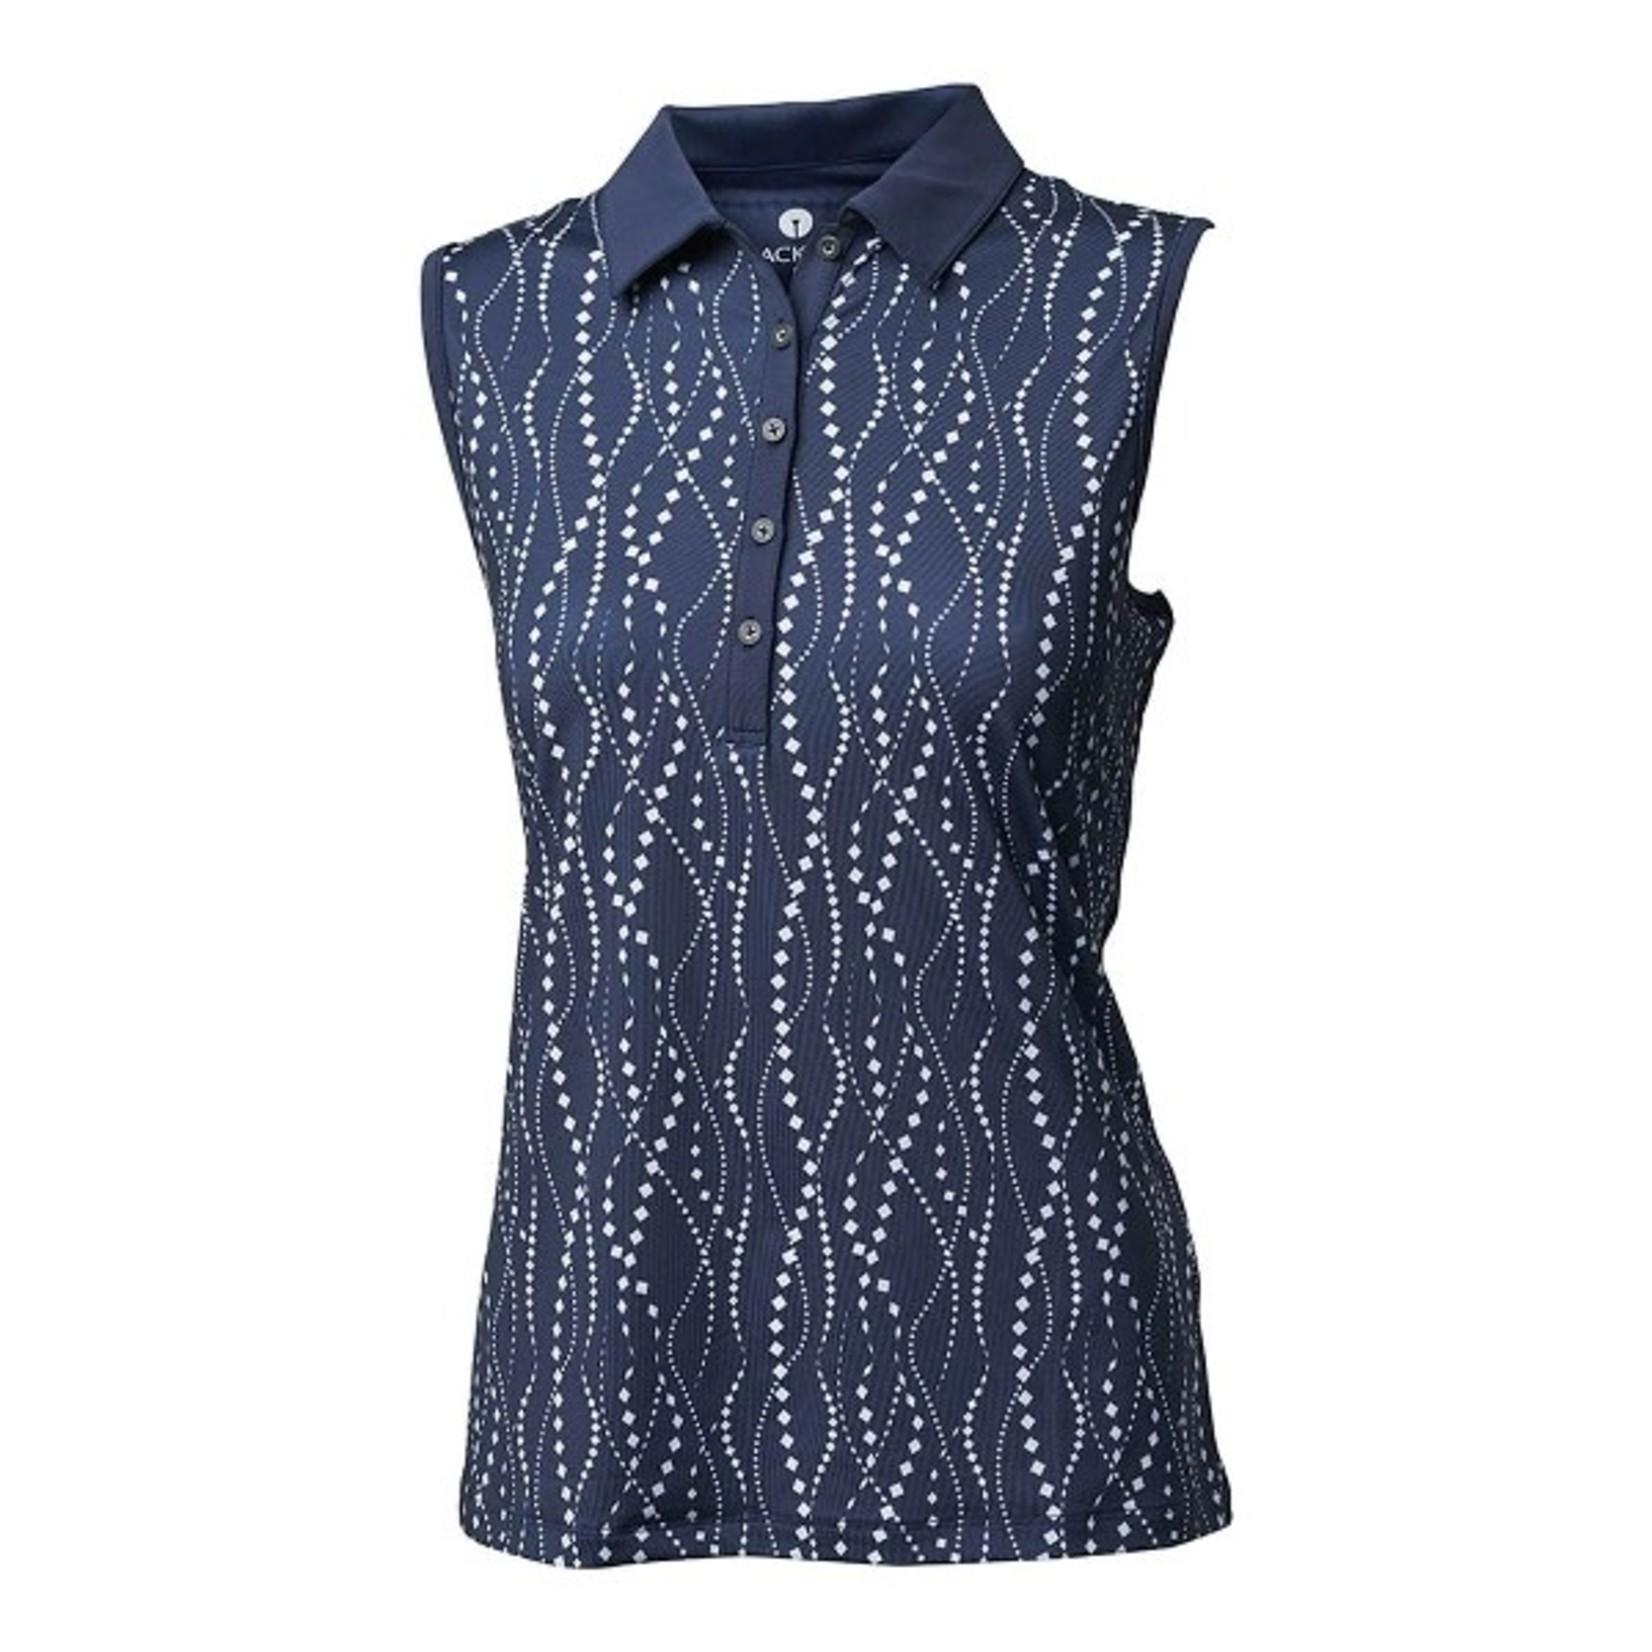 Backtee Backtee Ladies Printed Qd Uv Polo Top blauw XL